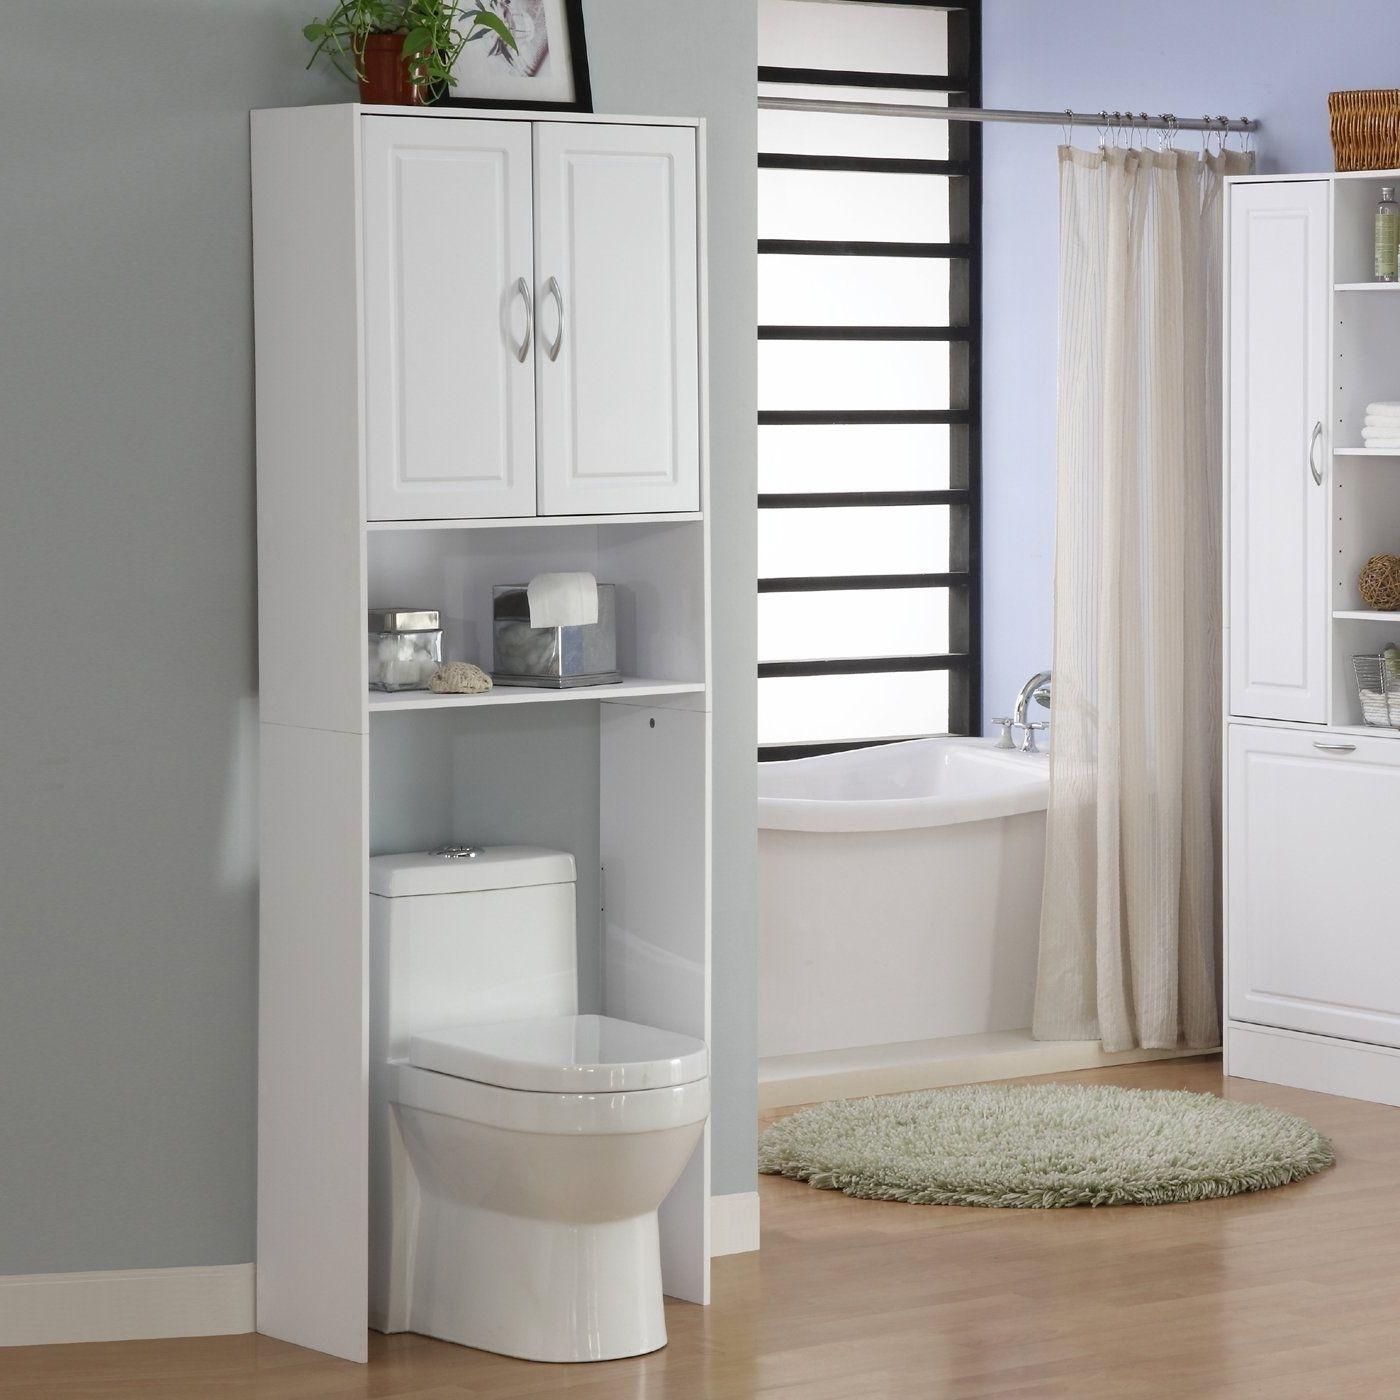 over the toilet storage cabinet kmart - Bathroom Cabinets Kmart